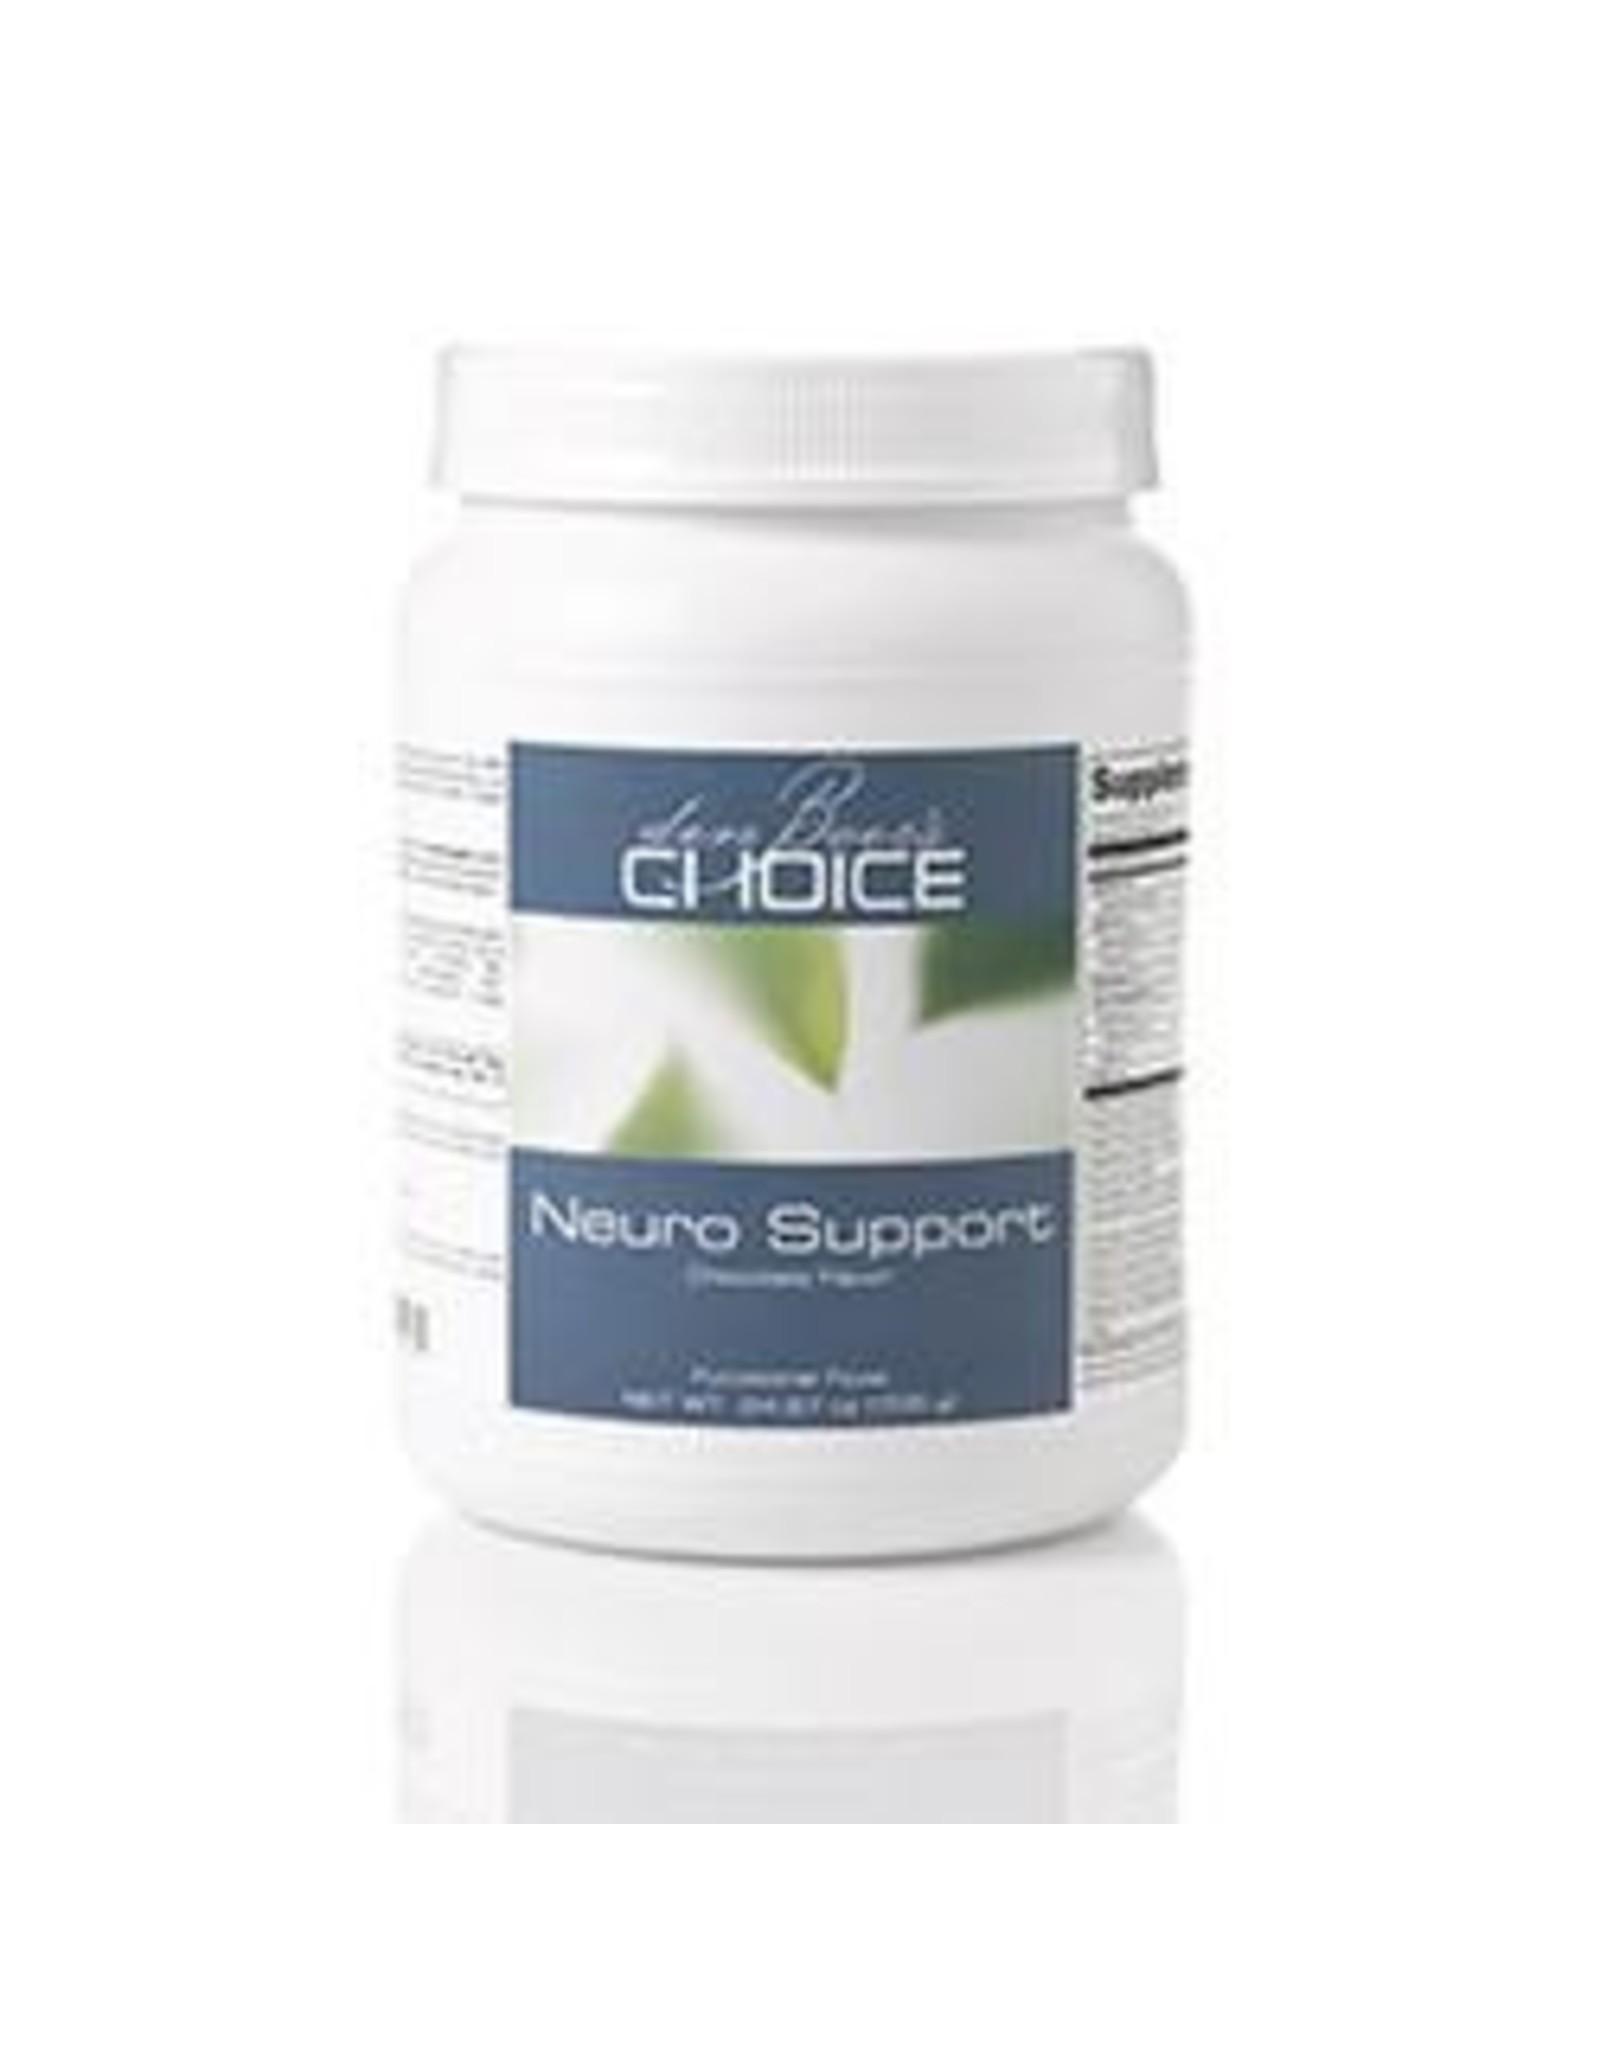 Neuro Support